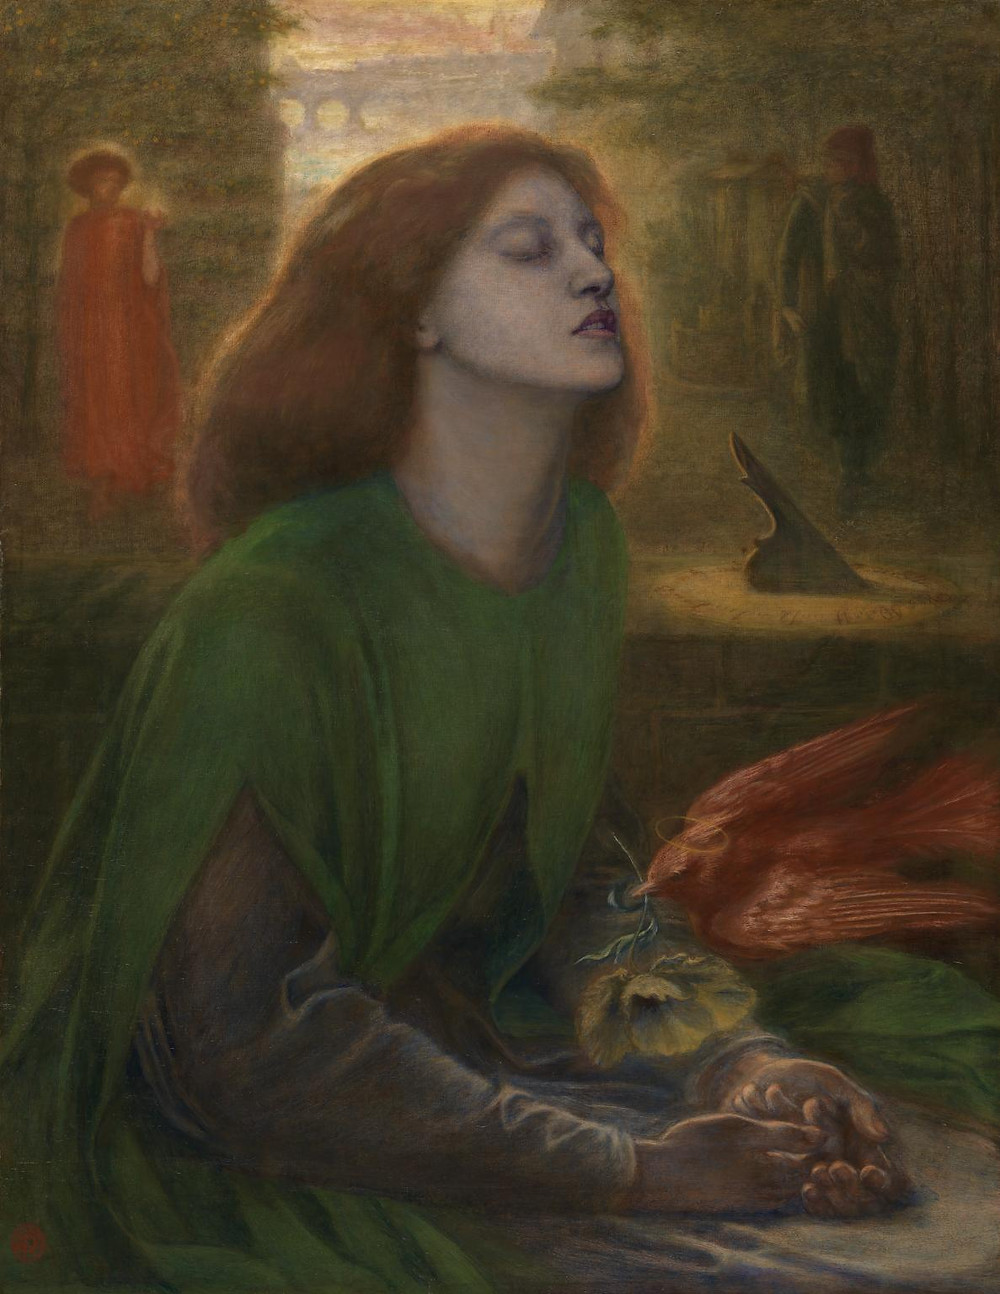 Beata Beatrix by Rossetti